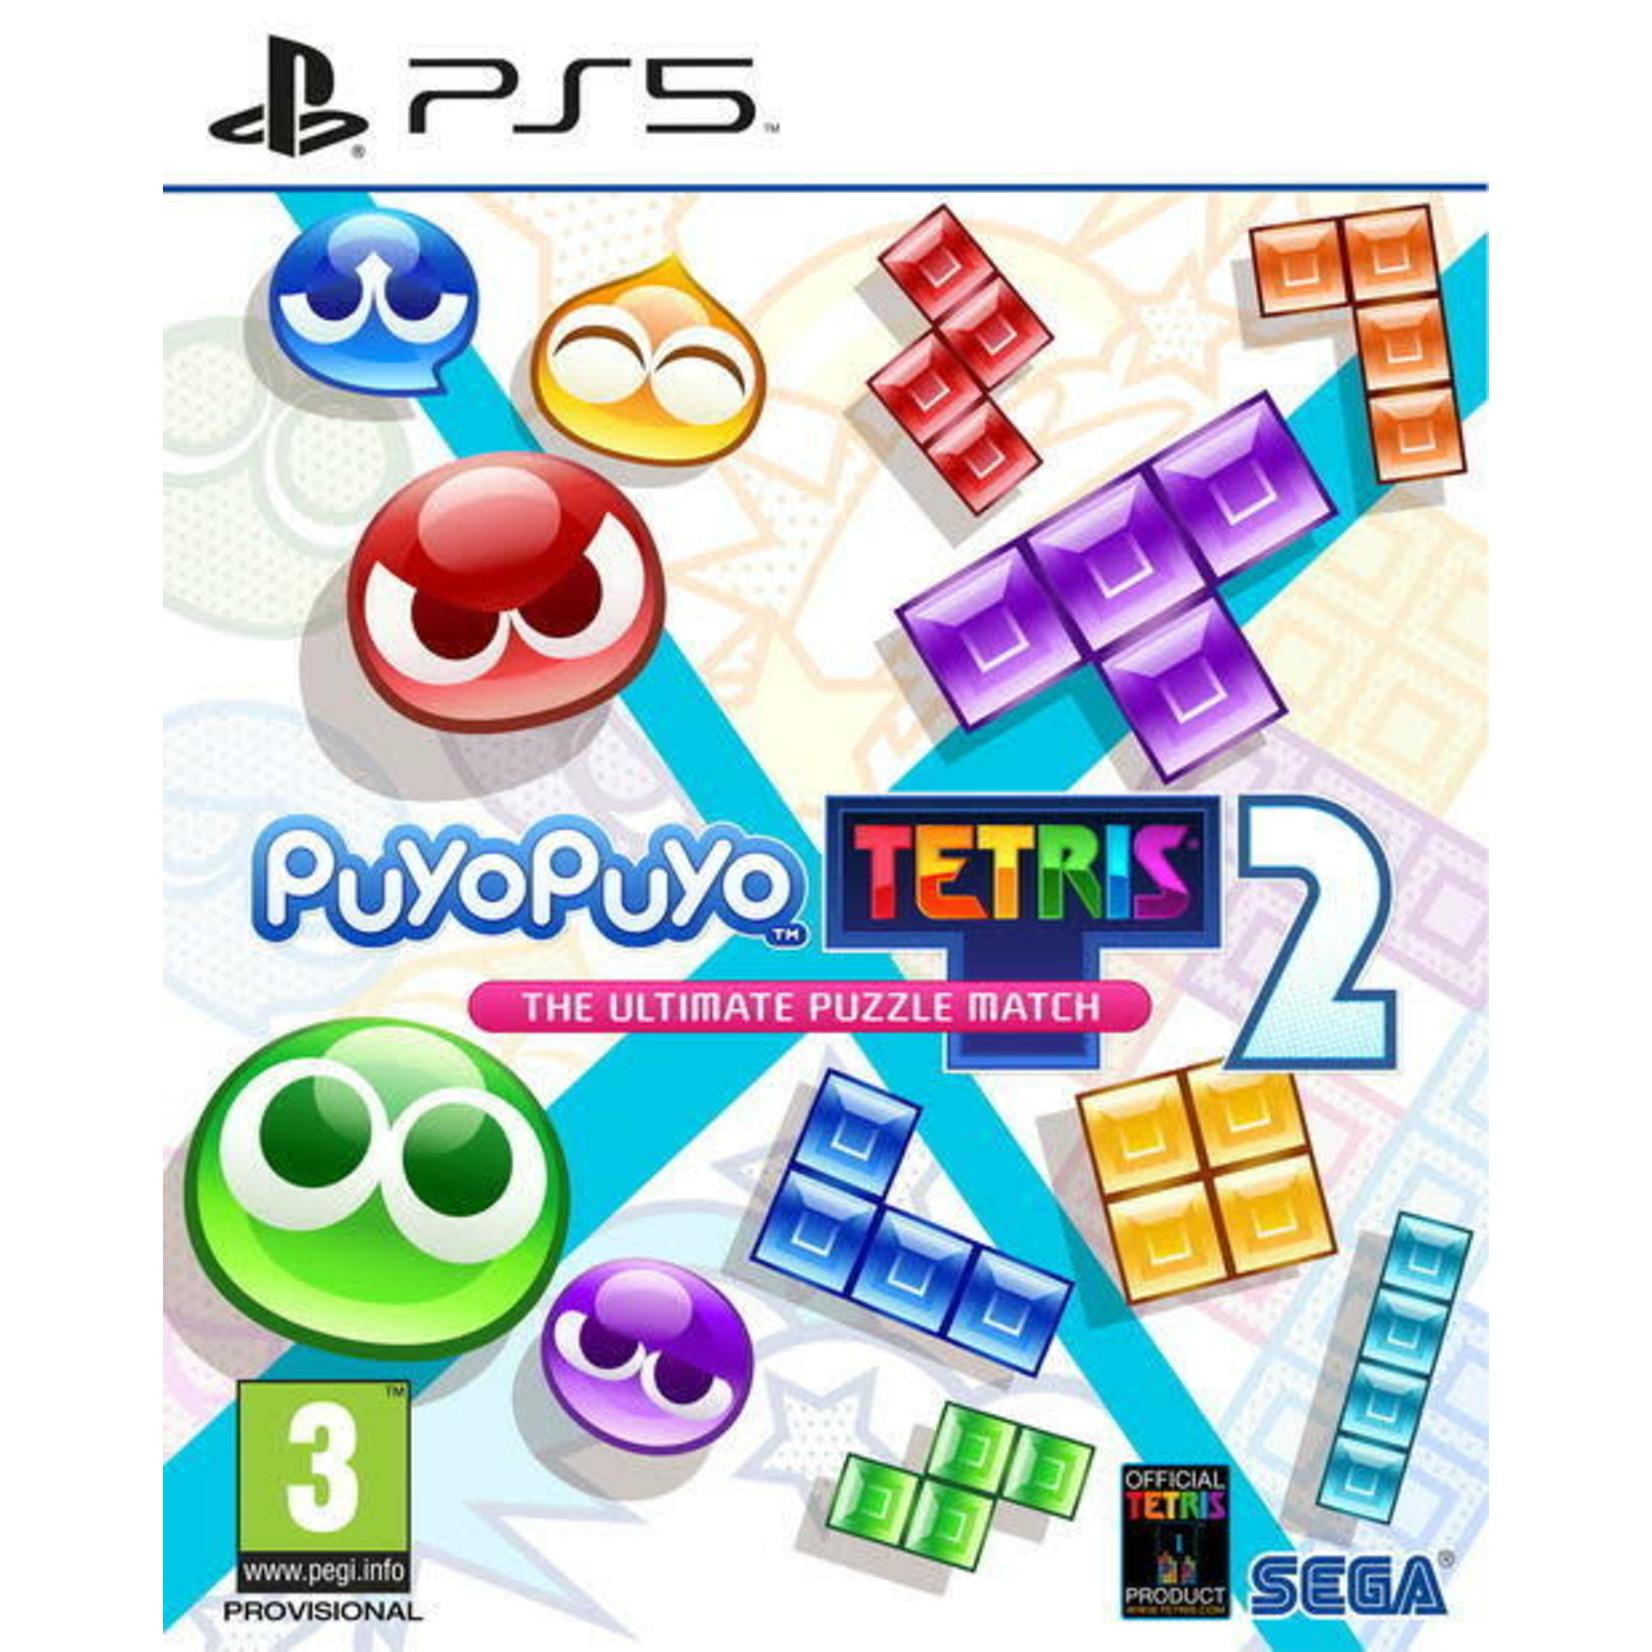 PS5-Puyo Puyo Tetris 2